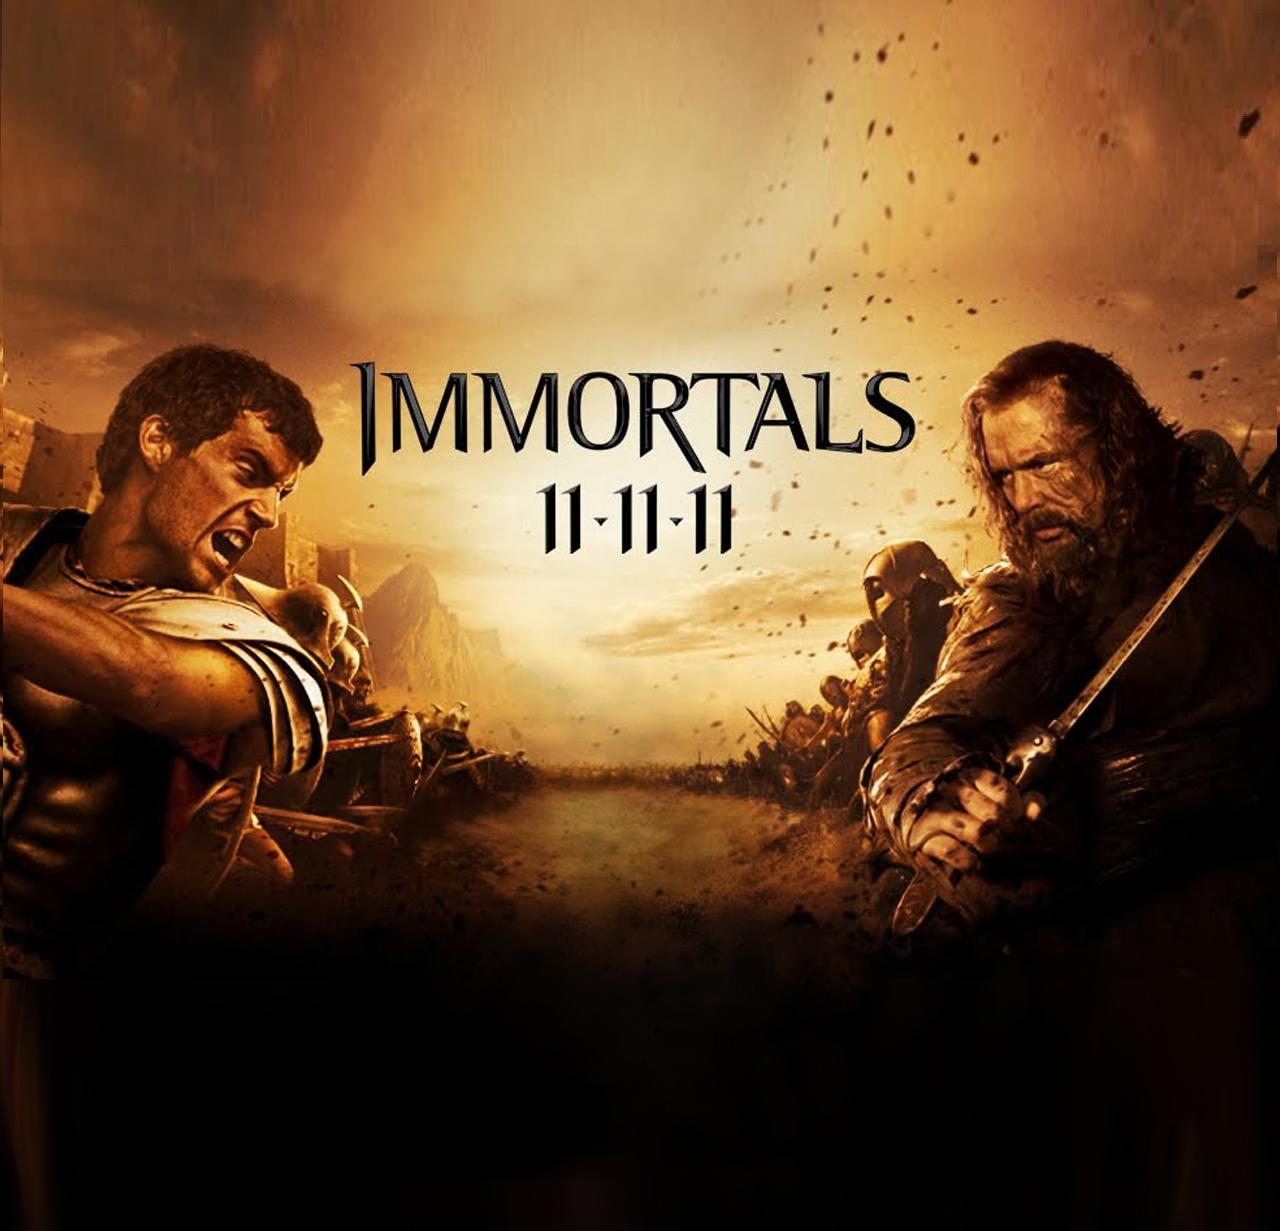 immortals full frame